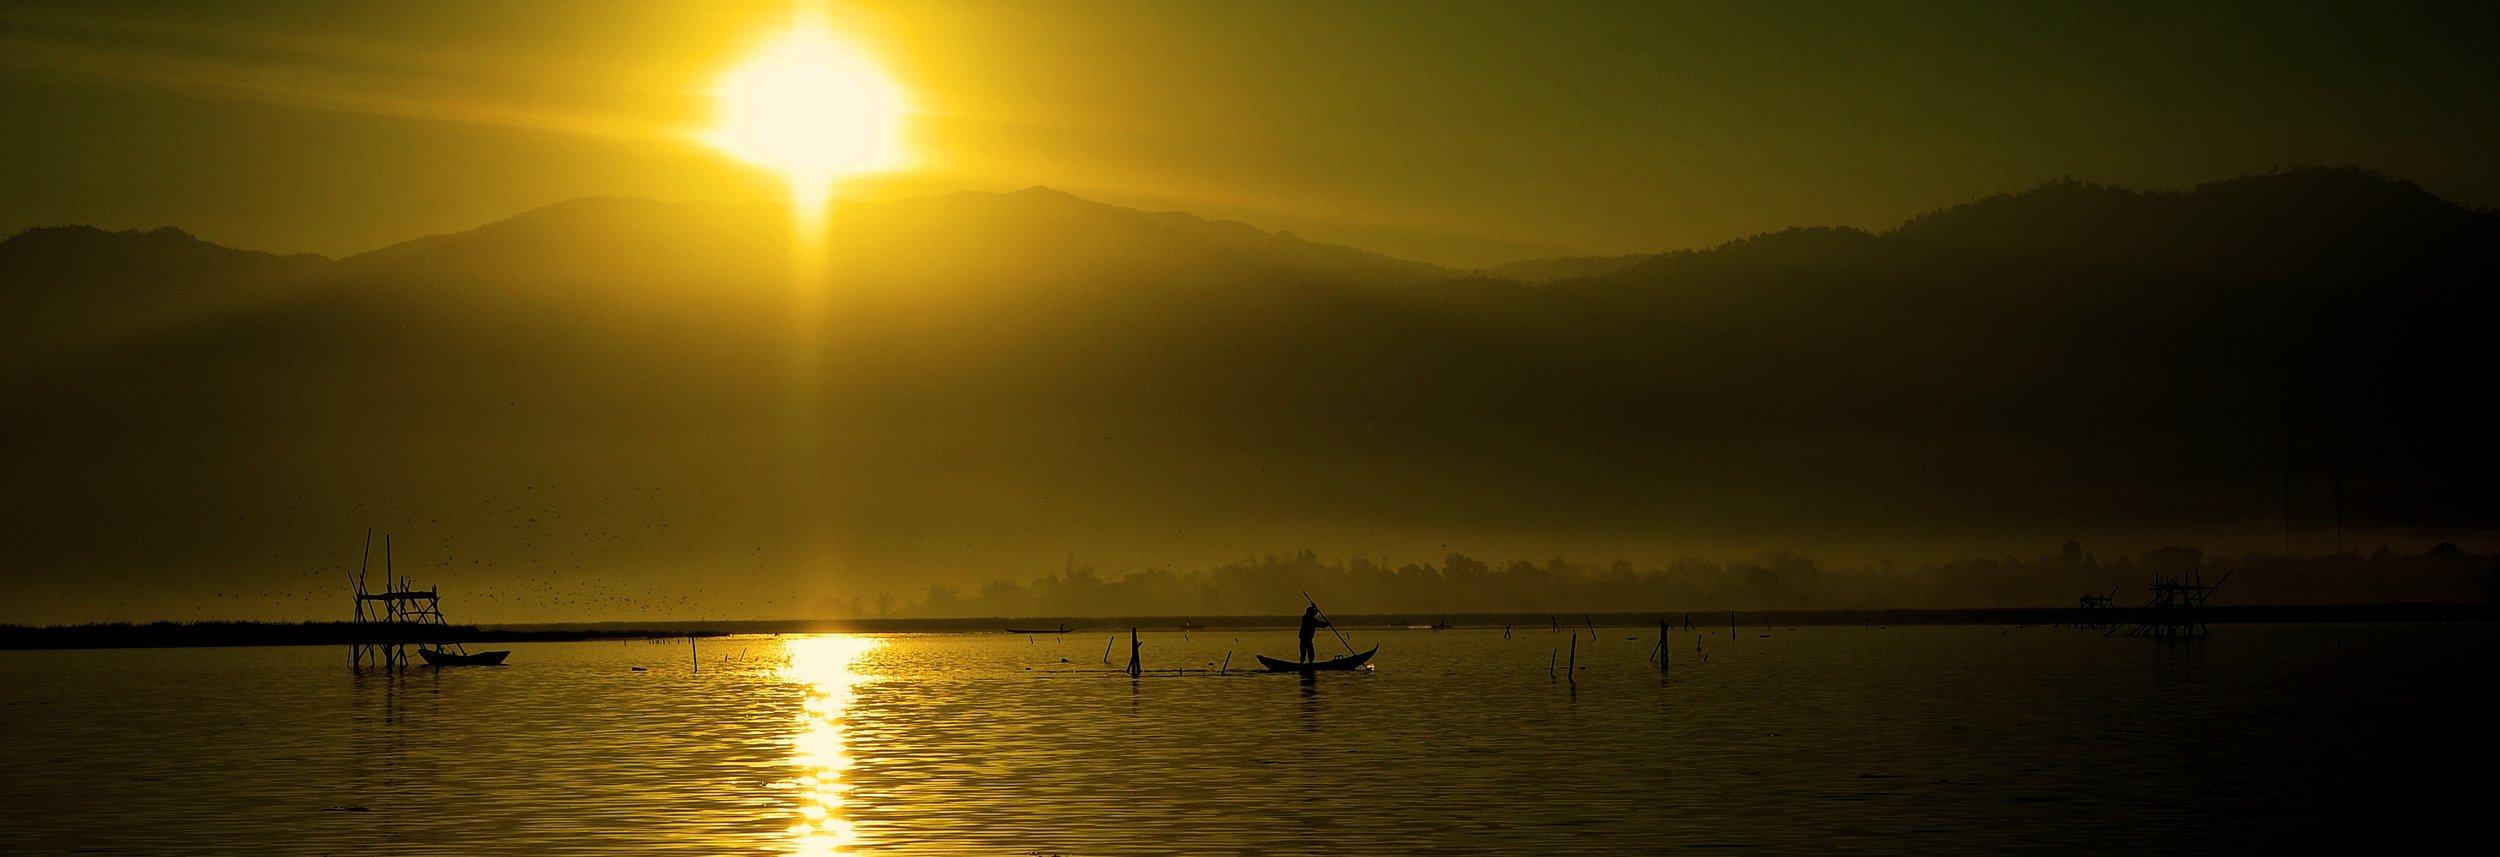 boats-dusk-fishing-88473.jpg